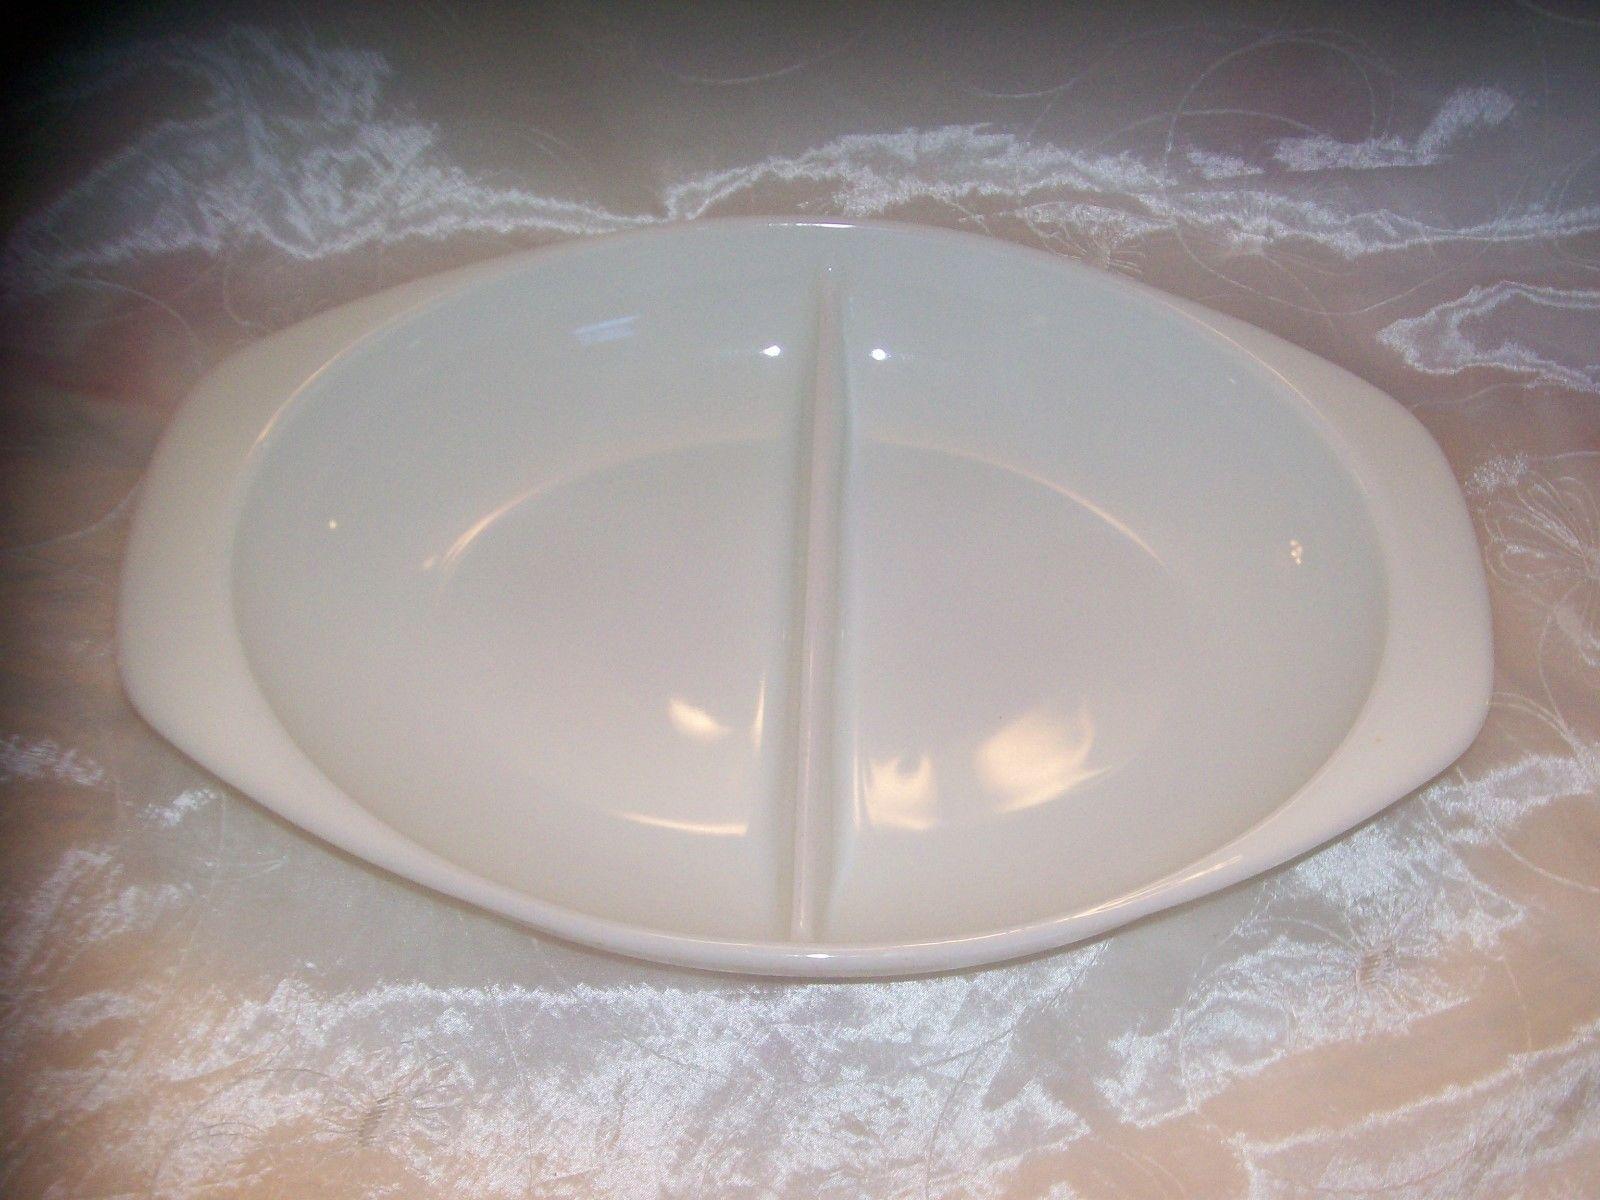 "Vtg Pyrex 1083 OPAL White Divided Casserole /Dish- 1 1/2 QT-13"" x 8 1/2"" x 2 EUC"